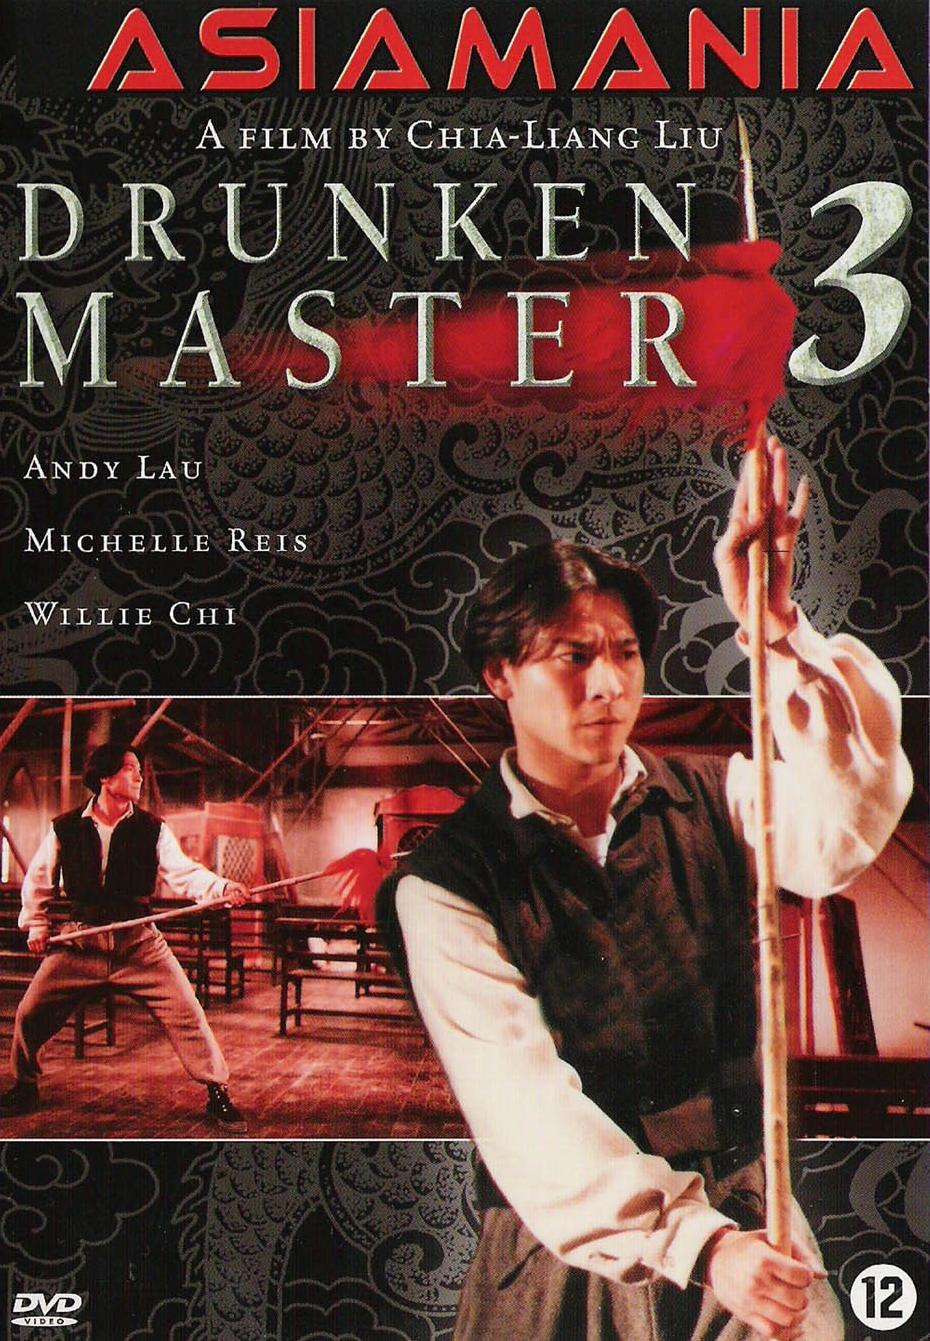 Пьяный мастер 3 - (Jui kuen III)